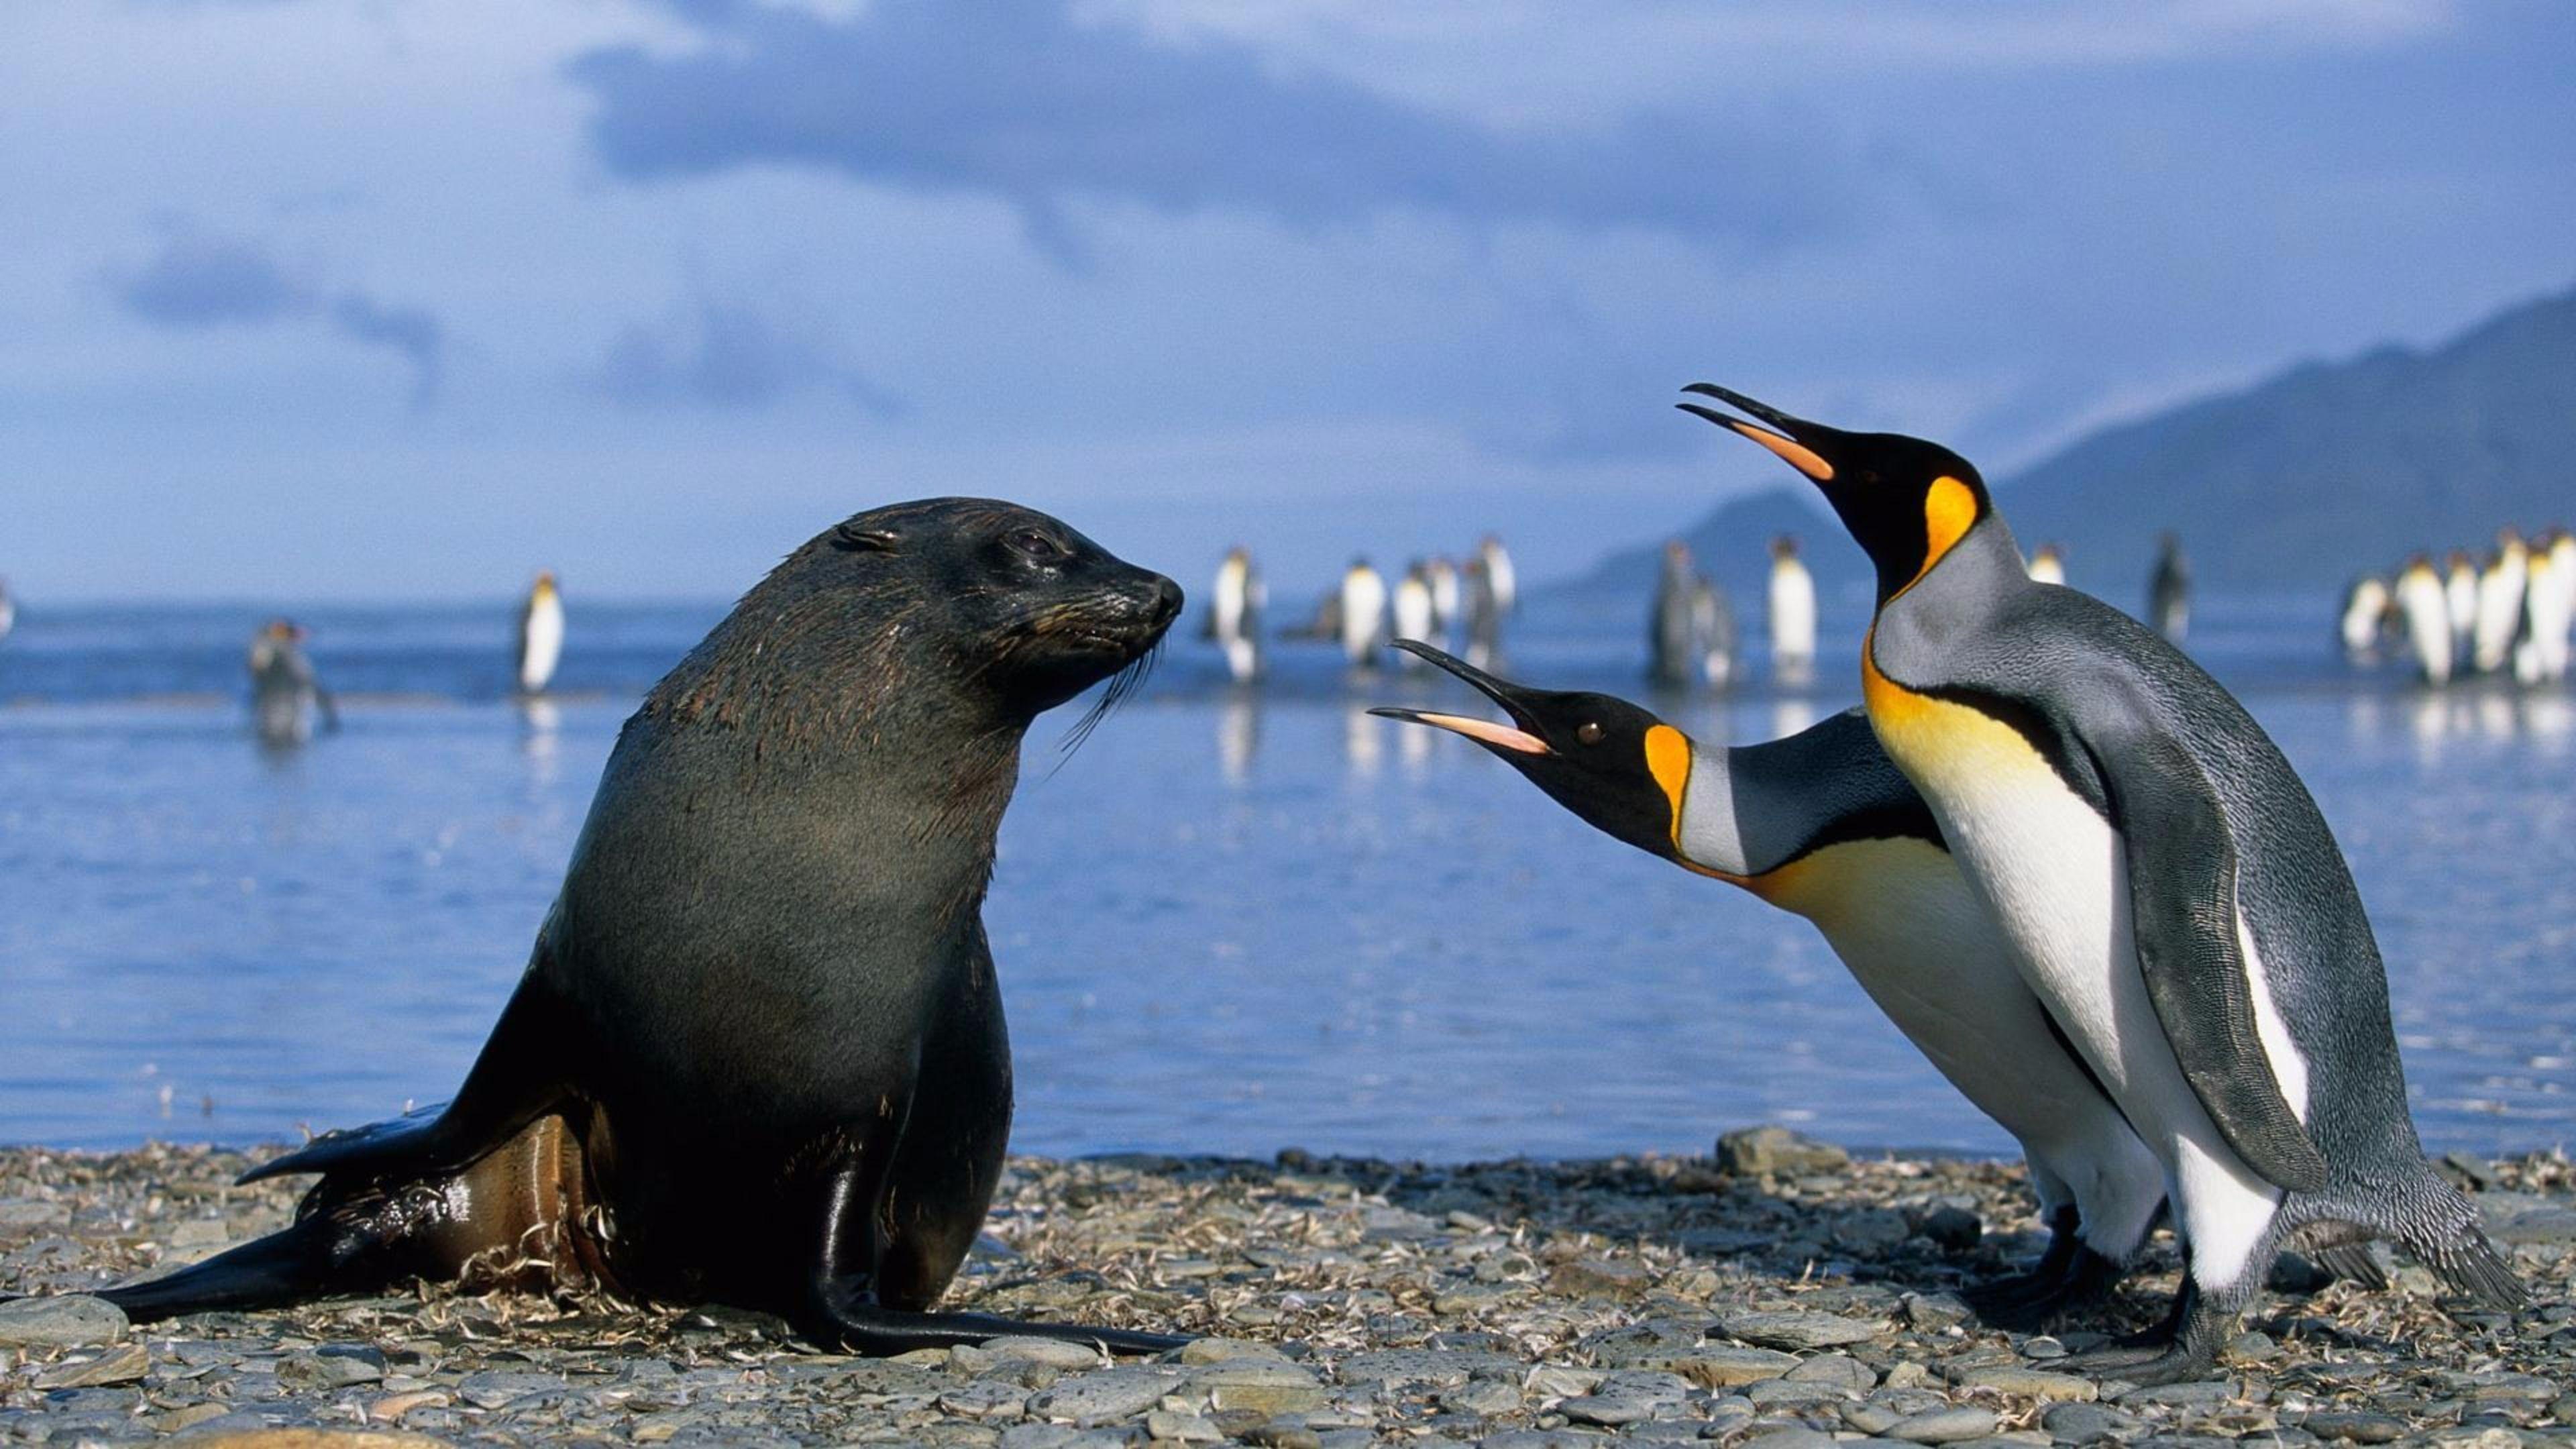 Walrus and Penguin S 4K wallpaper